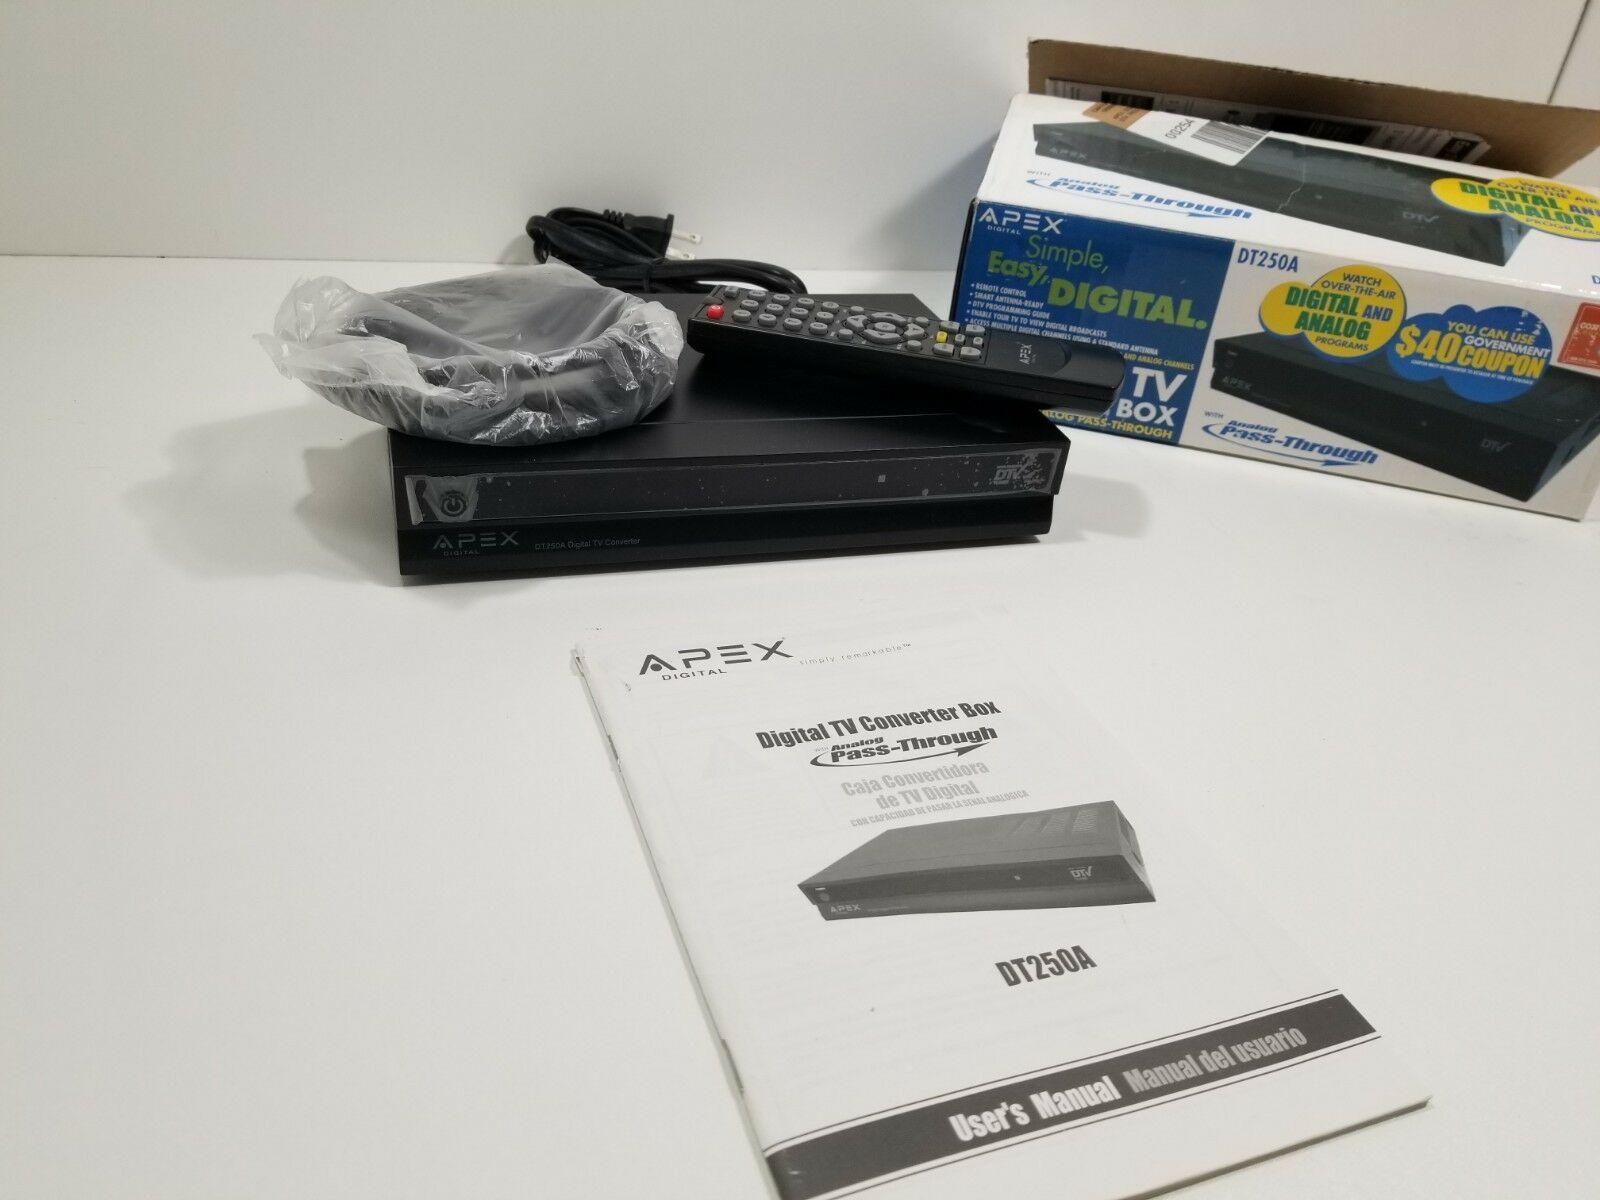 APEX DT250A Digital TV converter box